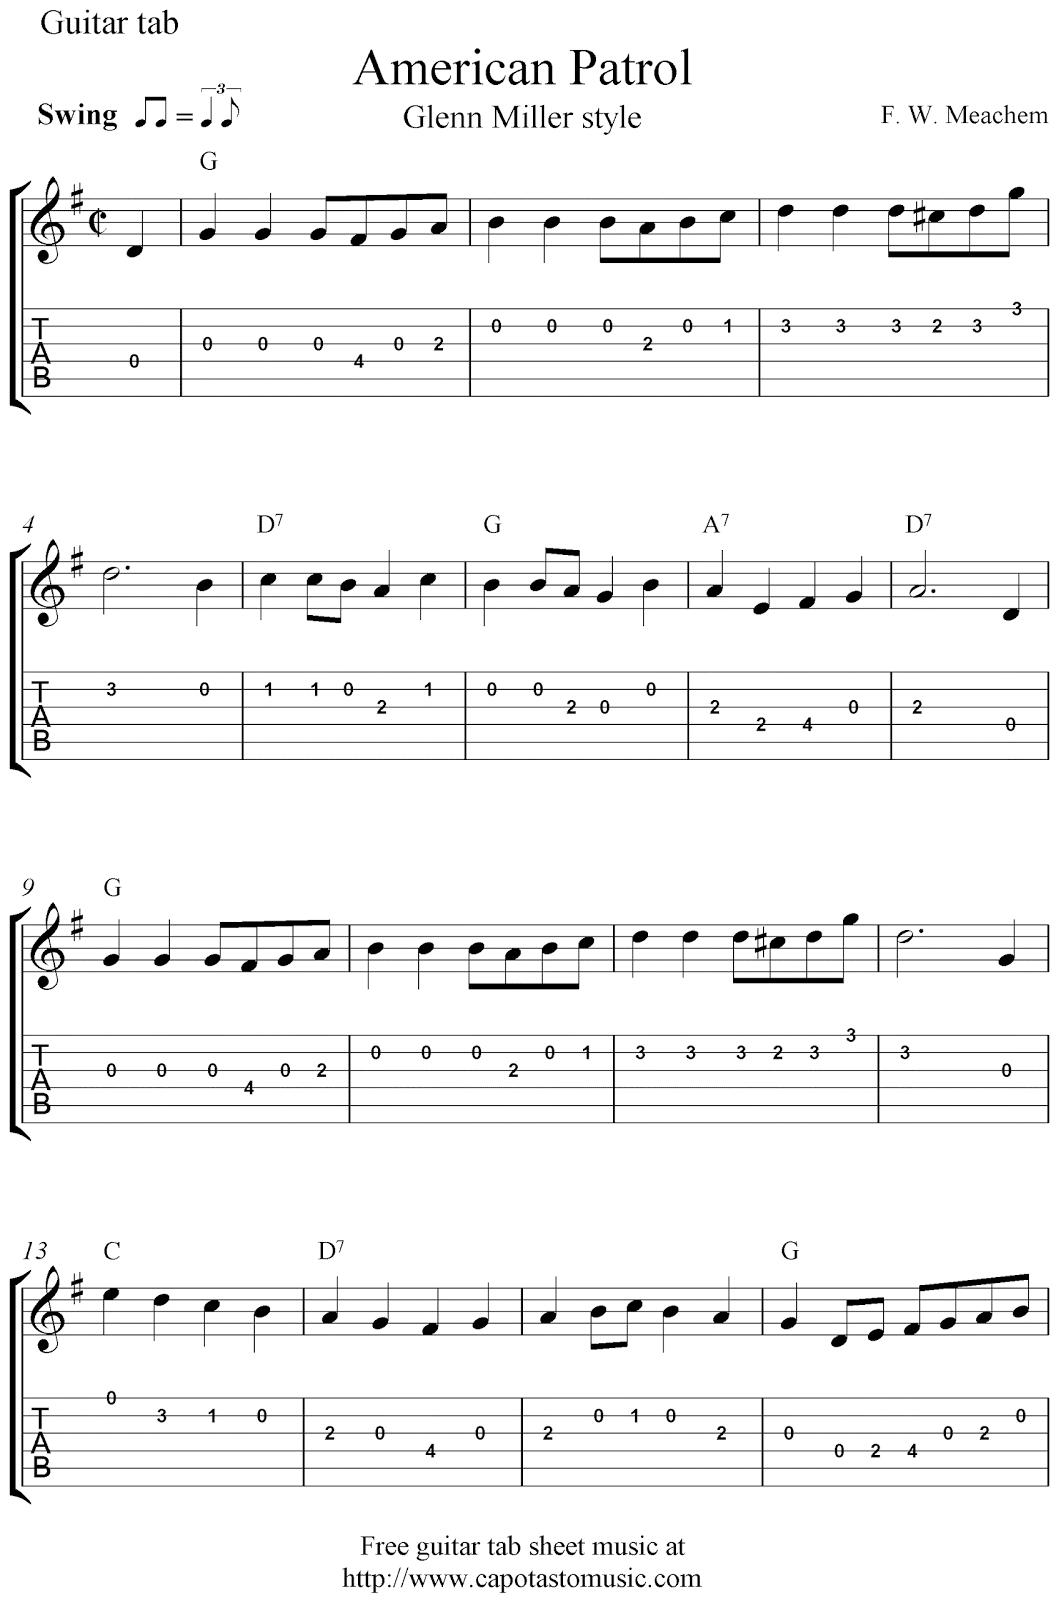 Free guitar tab sheet music, American Patrol